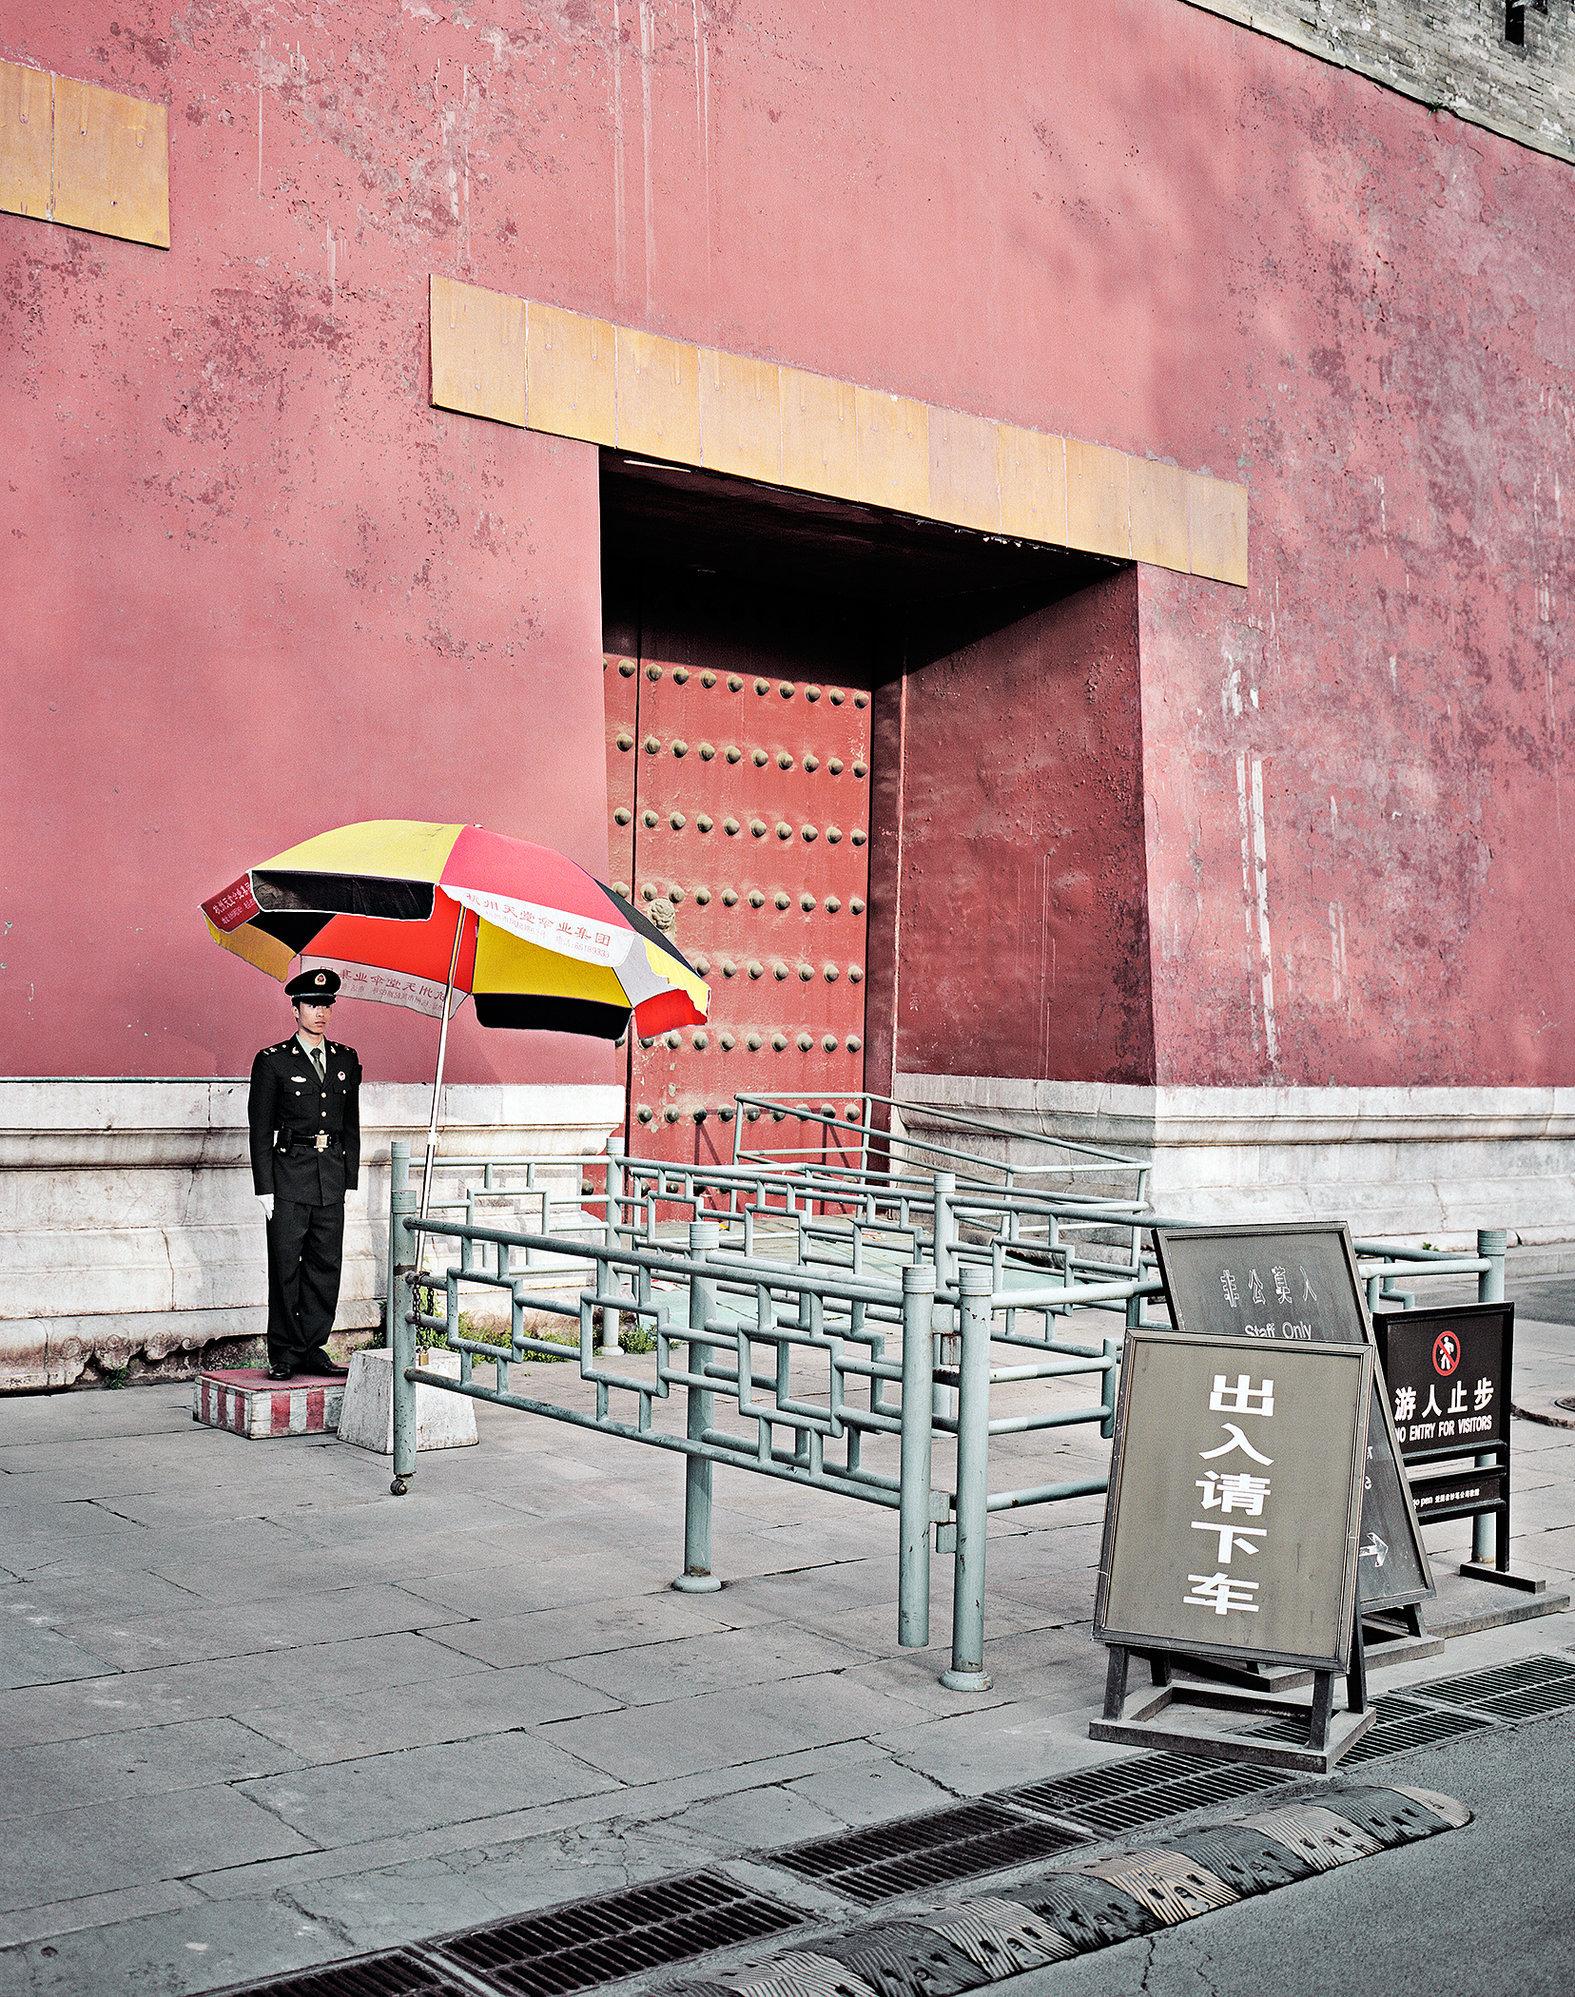 Beijing_May_09_Roll_16_Fr1(RGB_Crop)_MASTER.jpg